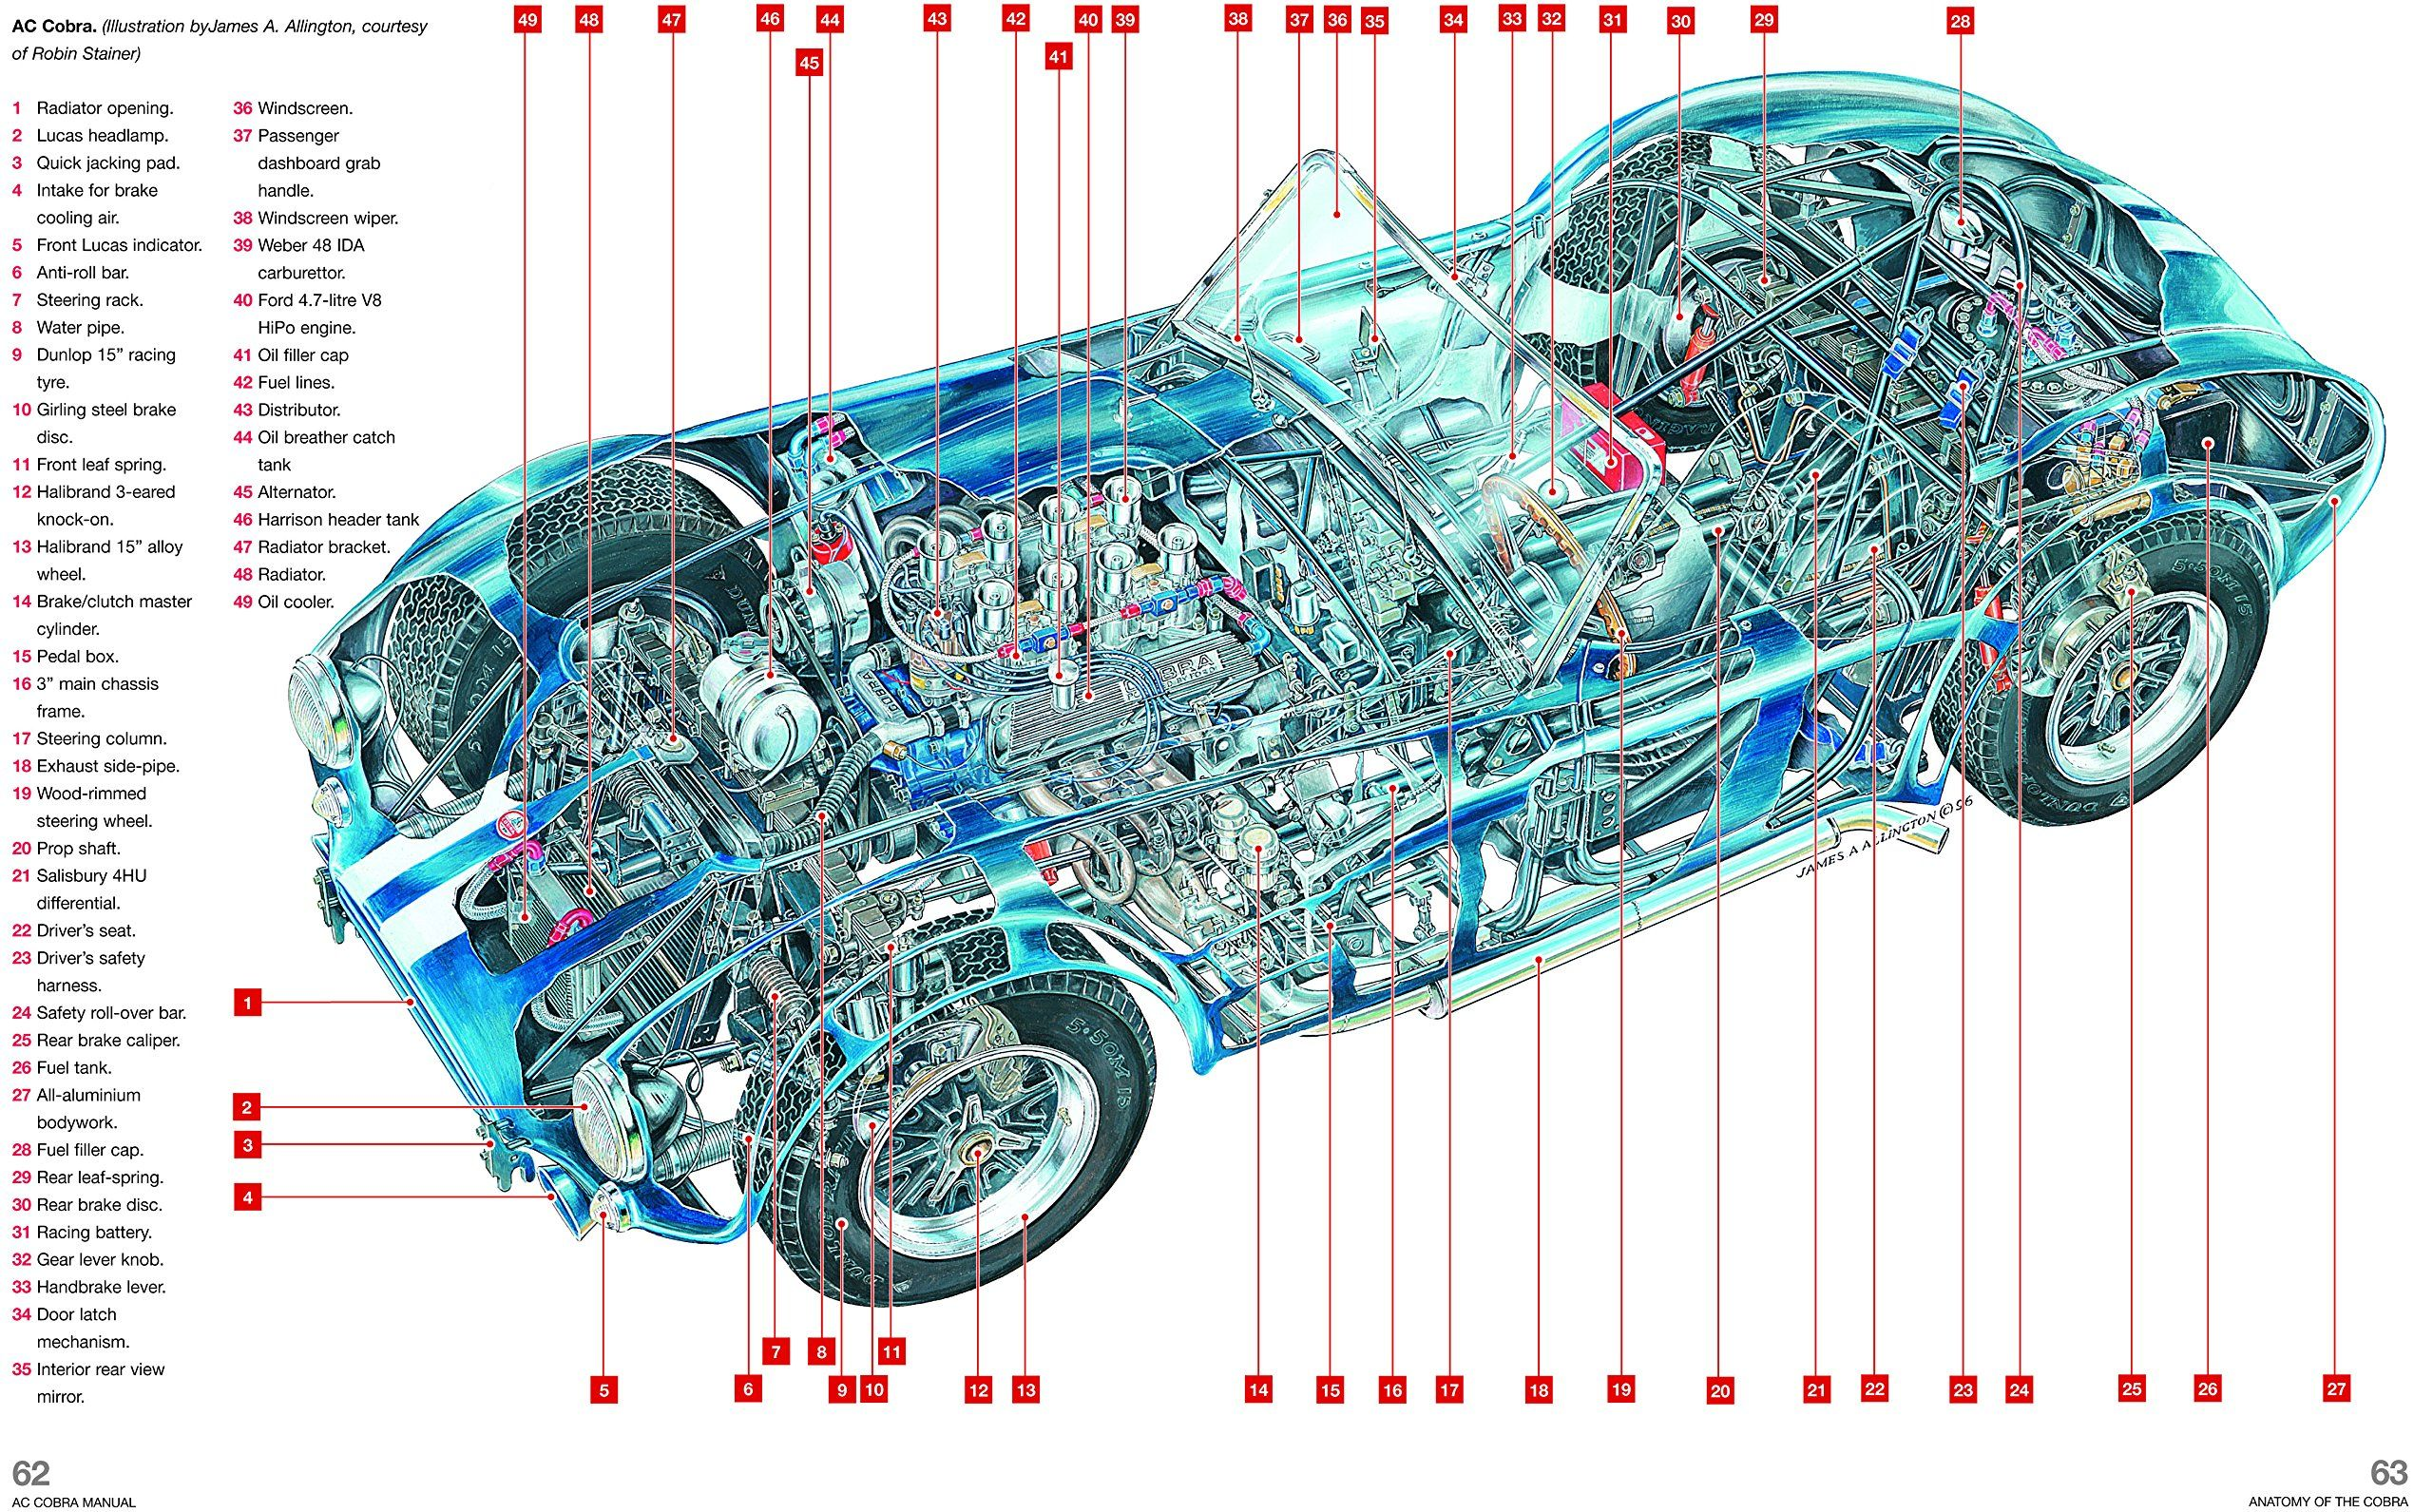 Wiring Diagram Ac Cobra 1962 - Free Car Wiring Diagrams •